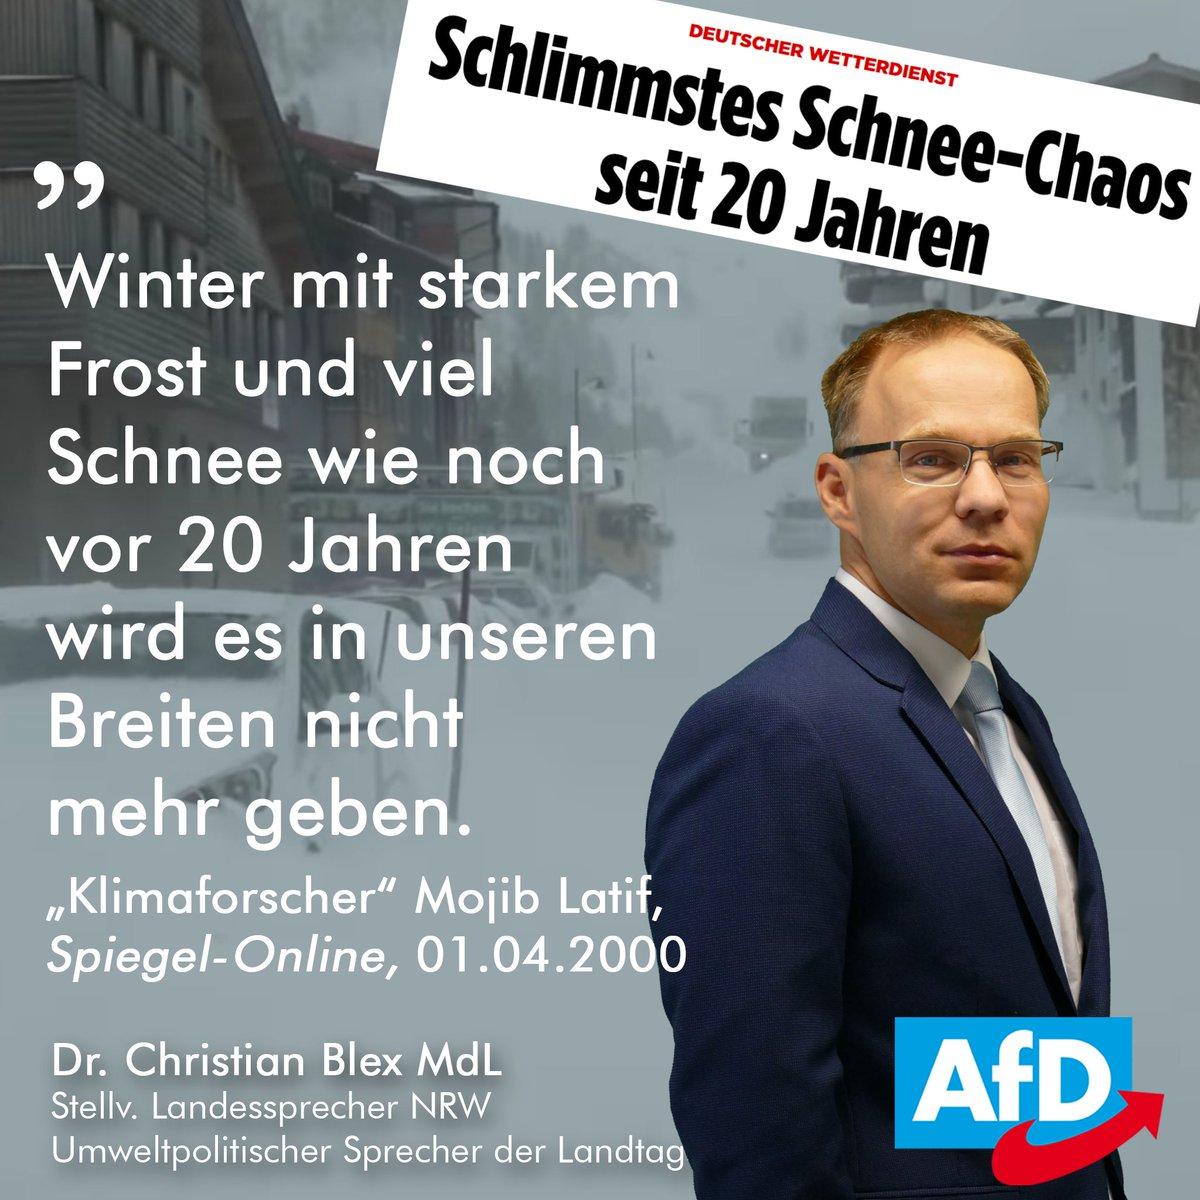 Dr. Christian Blex, MdL's photo on #Schneechaos